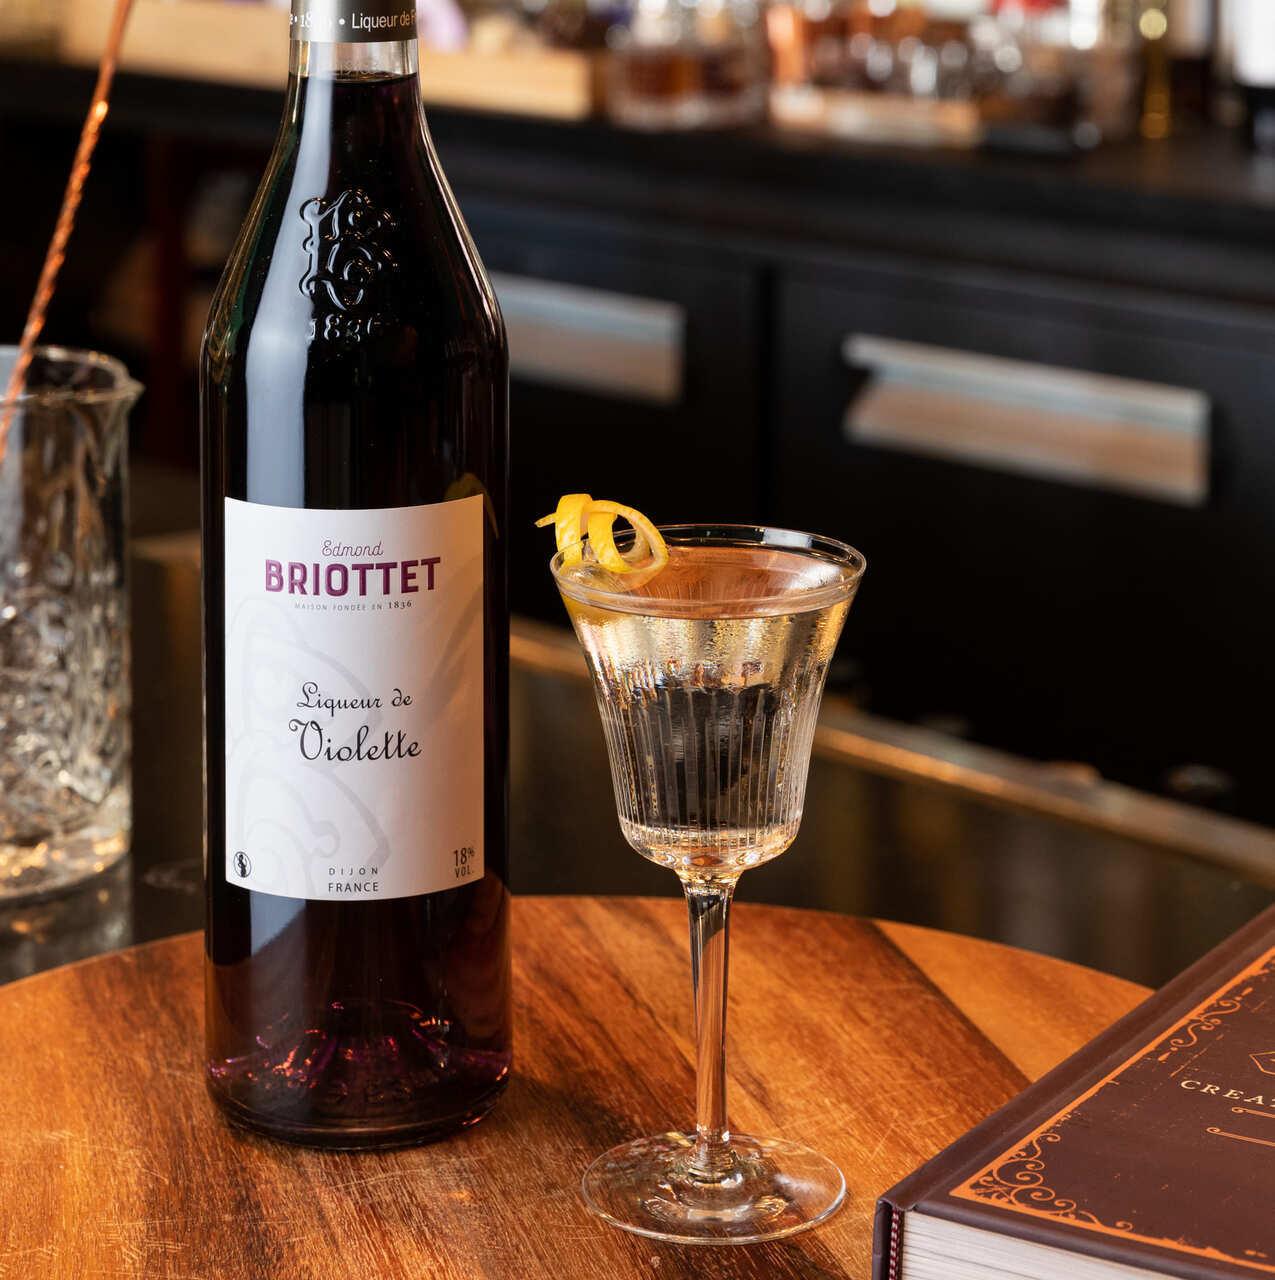 briottet-cocktail-The-Attention-Violette-home